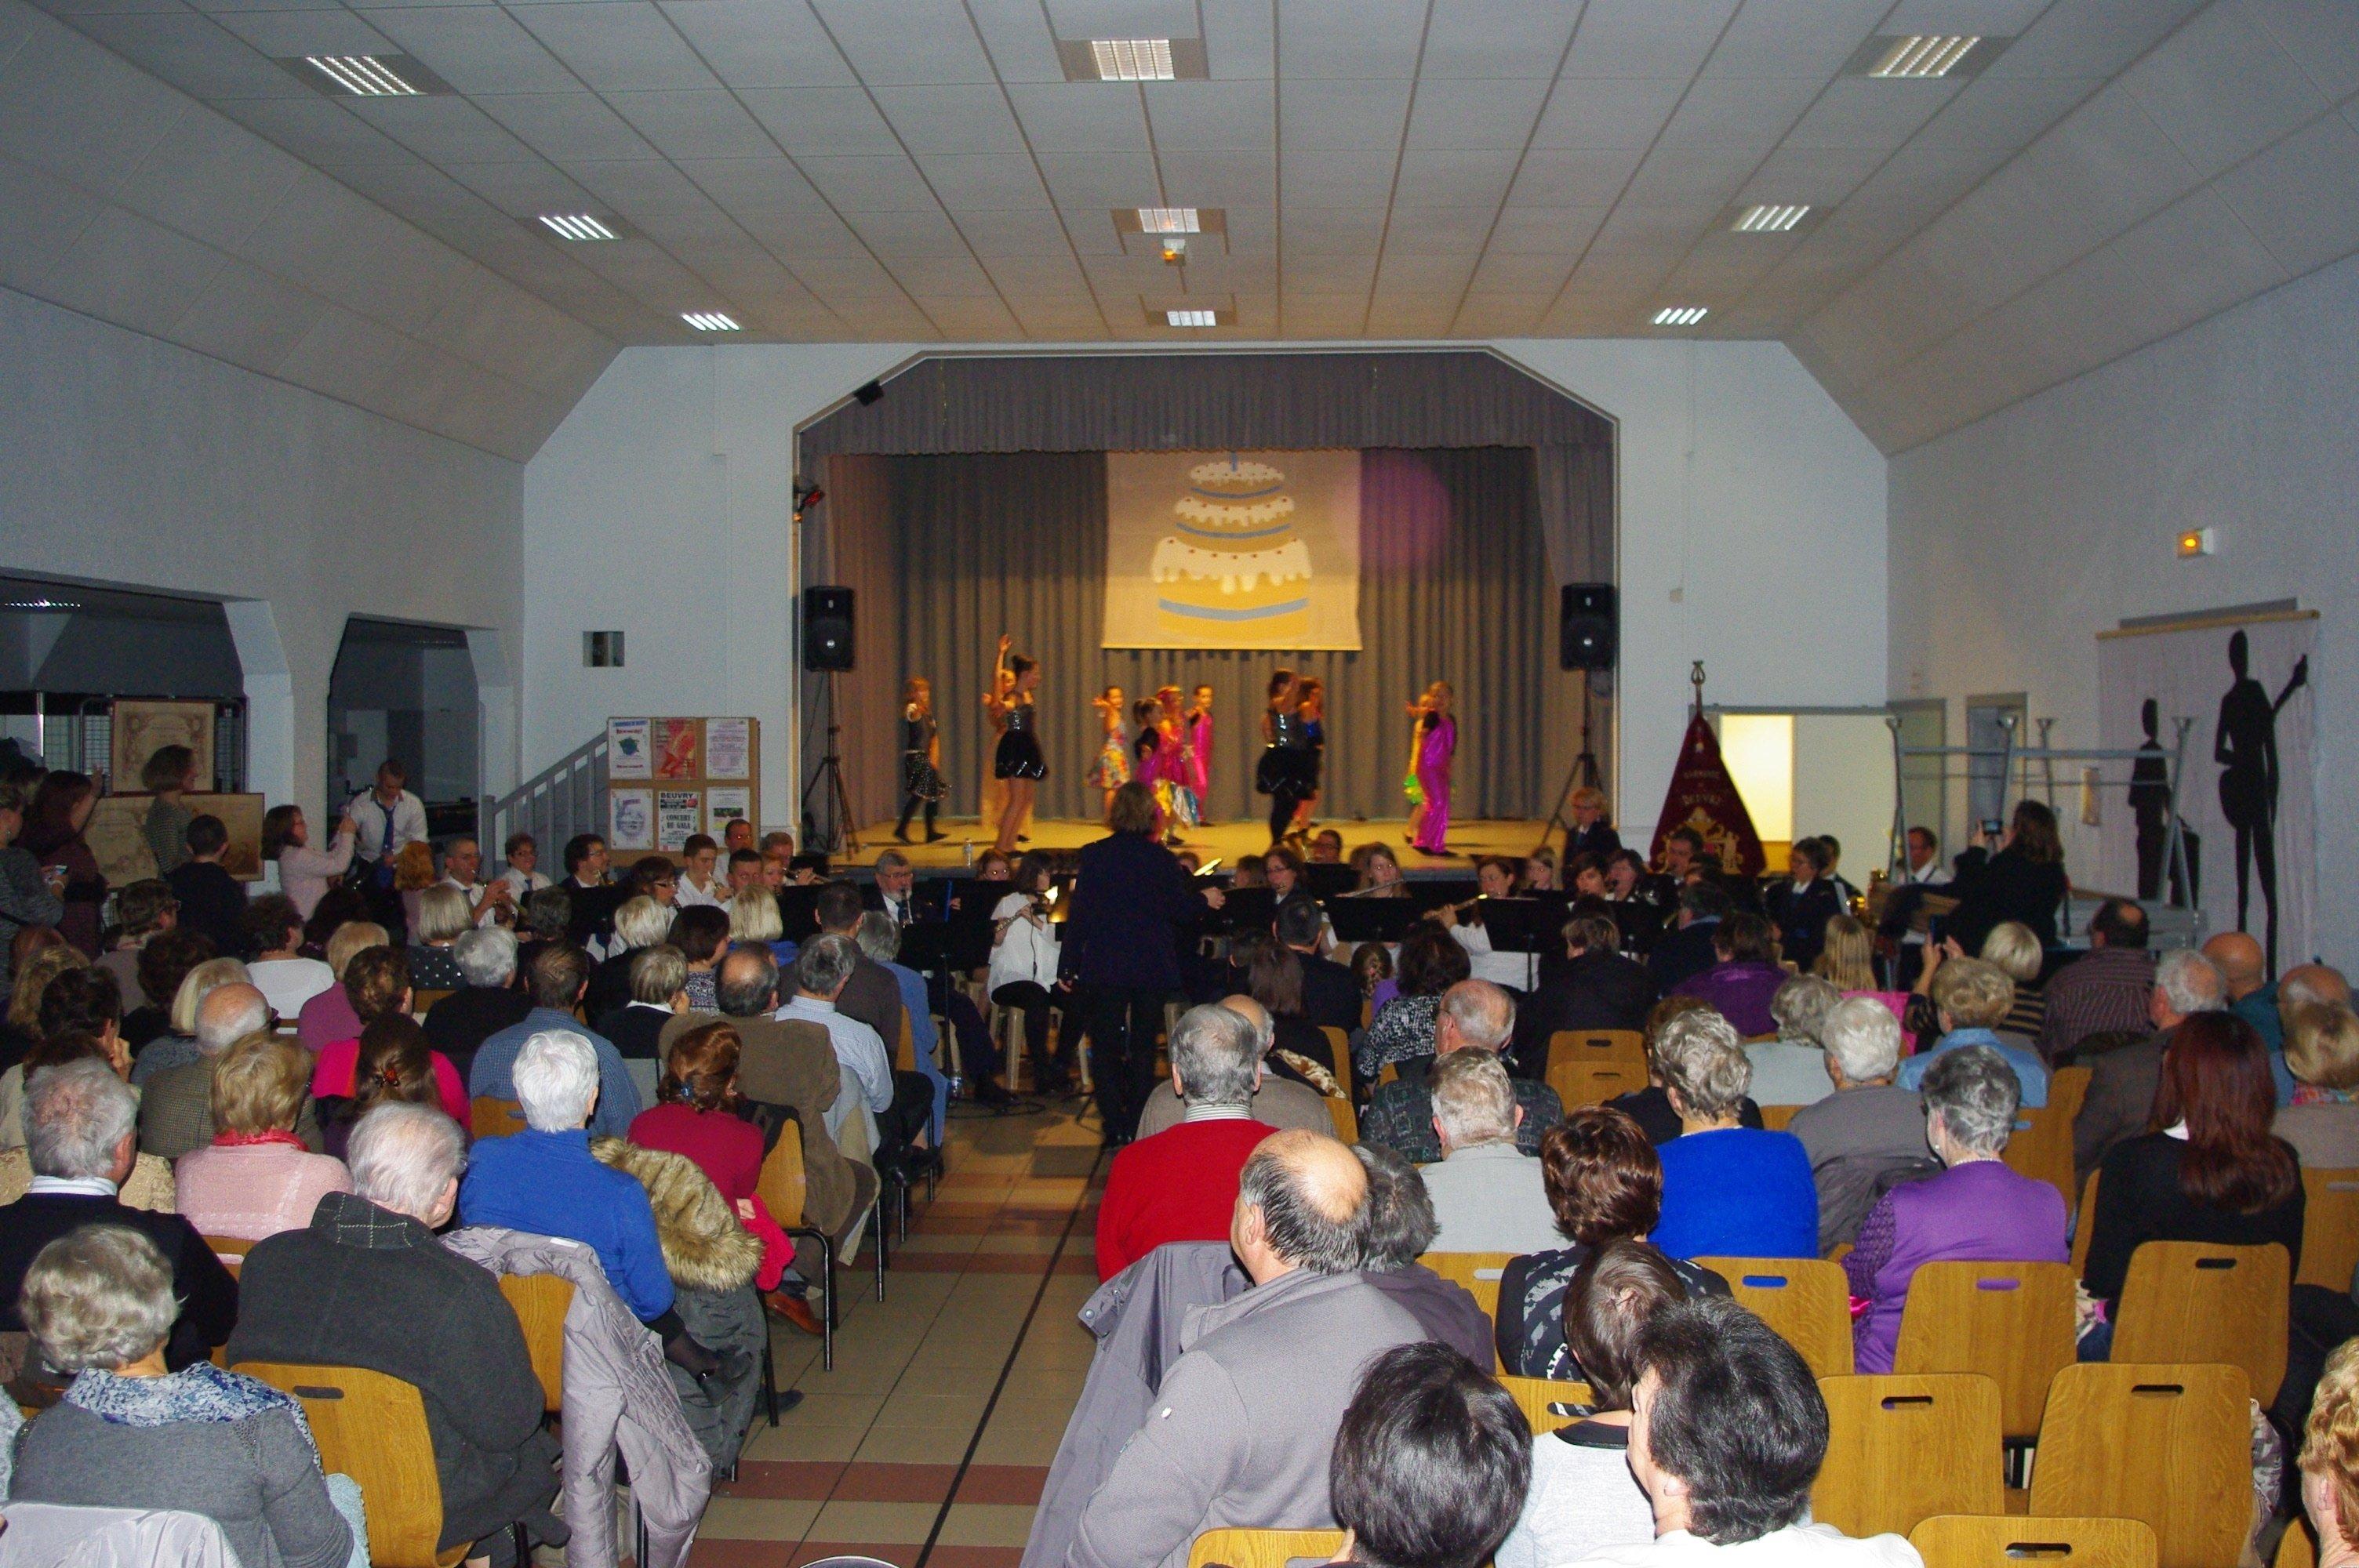 23-11-2014-multi-notes-119 2014 dans Harmonie de Beuvry